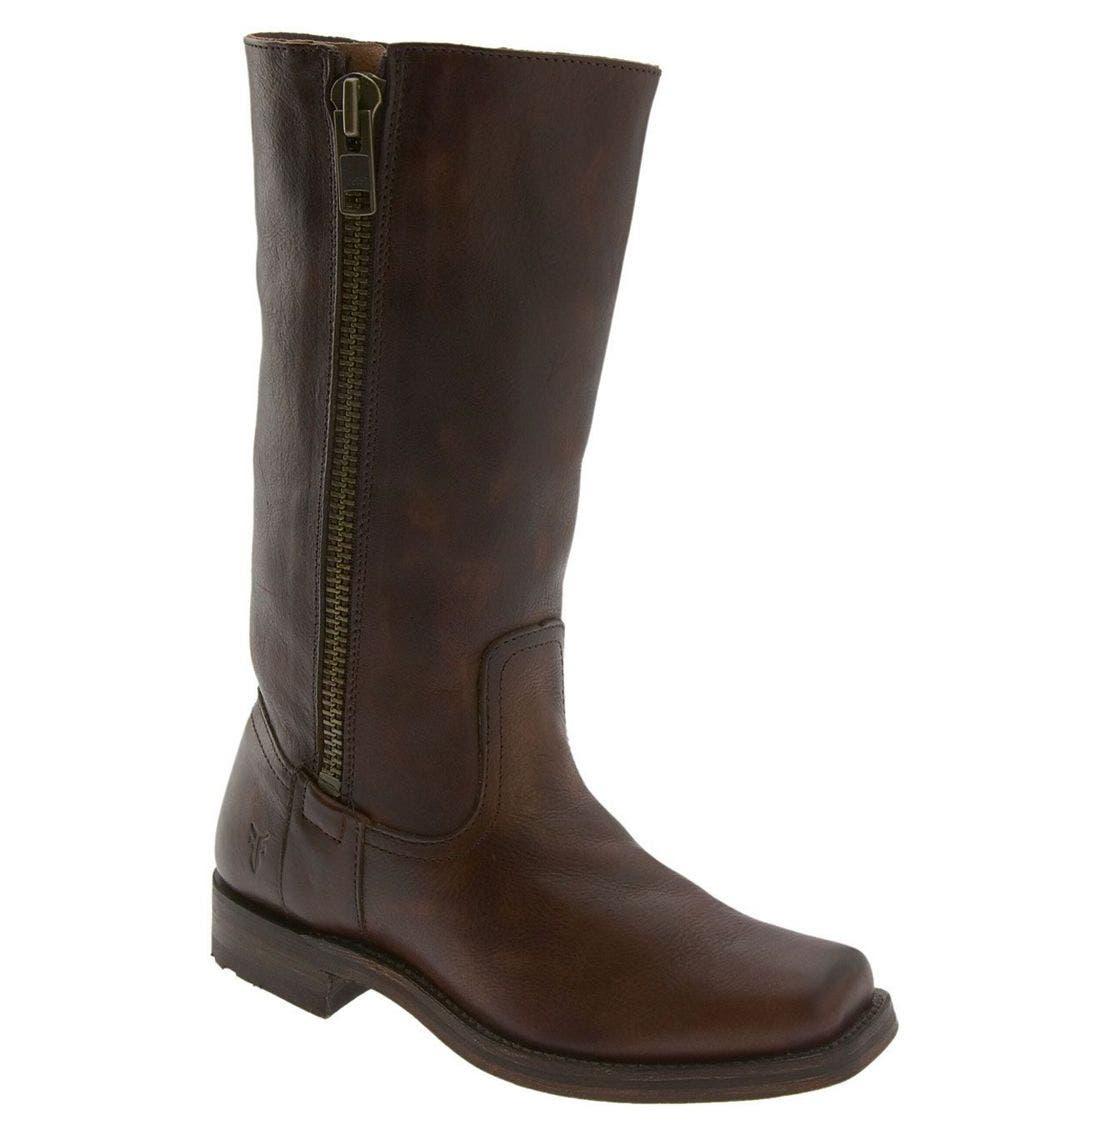 Alternate Image 1 Selected - Frye 'Heath' Outside Zip Boot